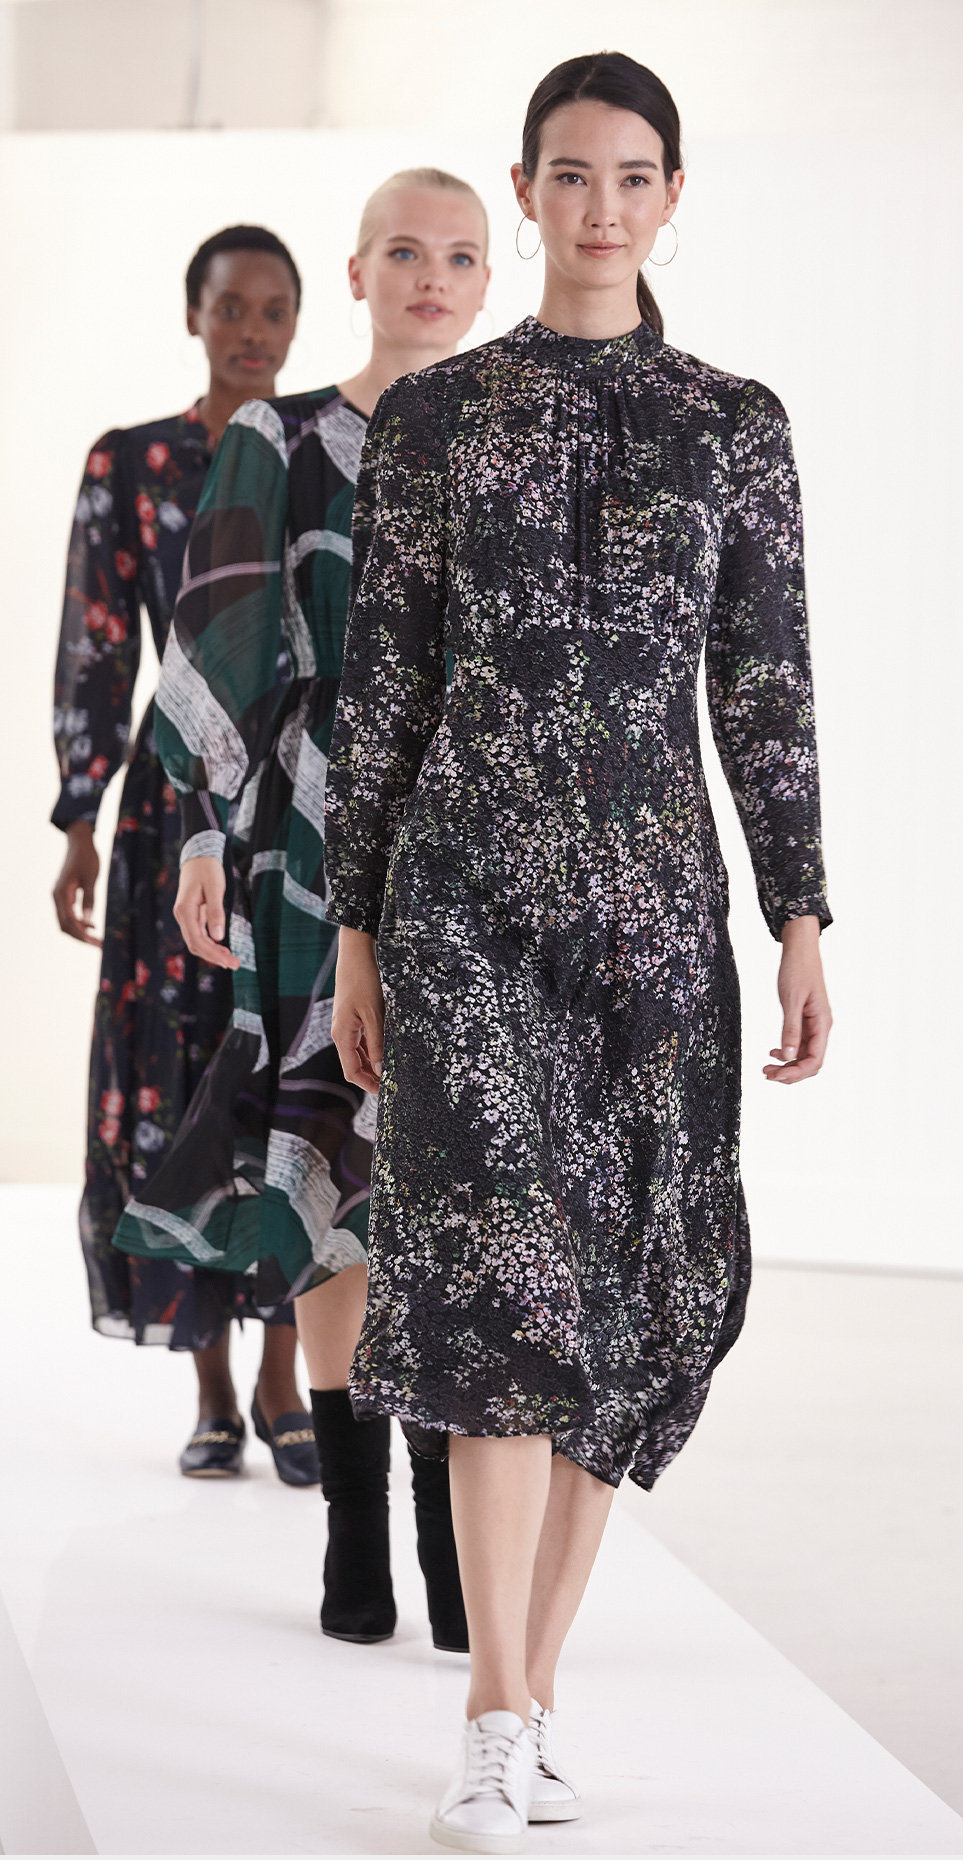 Elinore Printed Burnout Dress £140